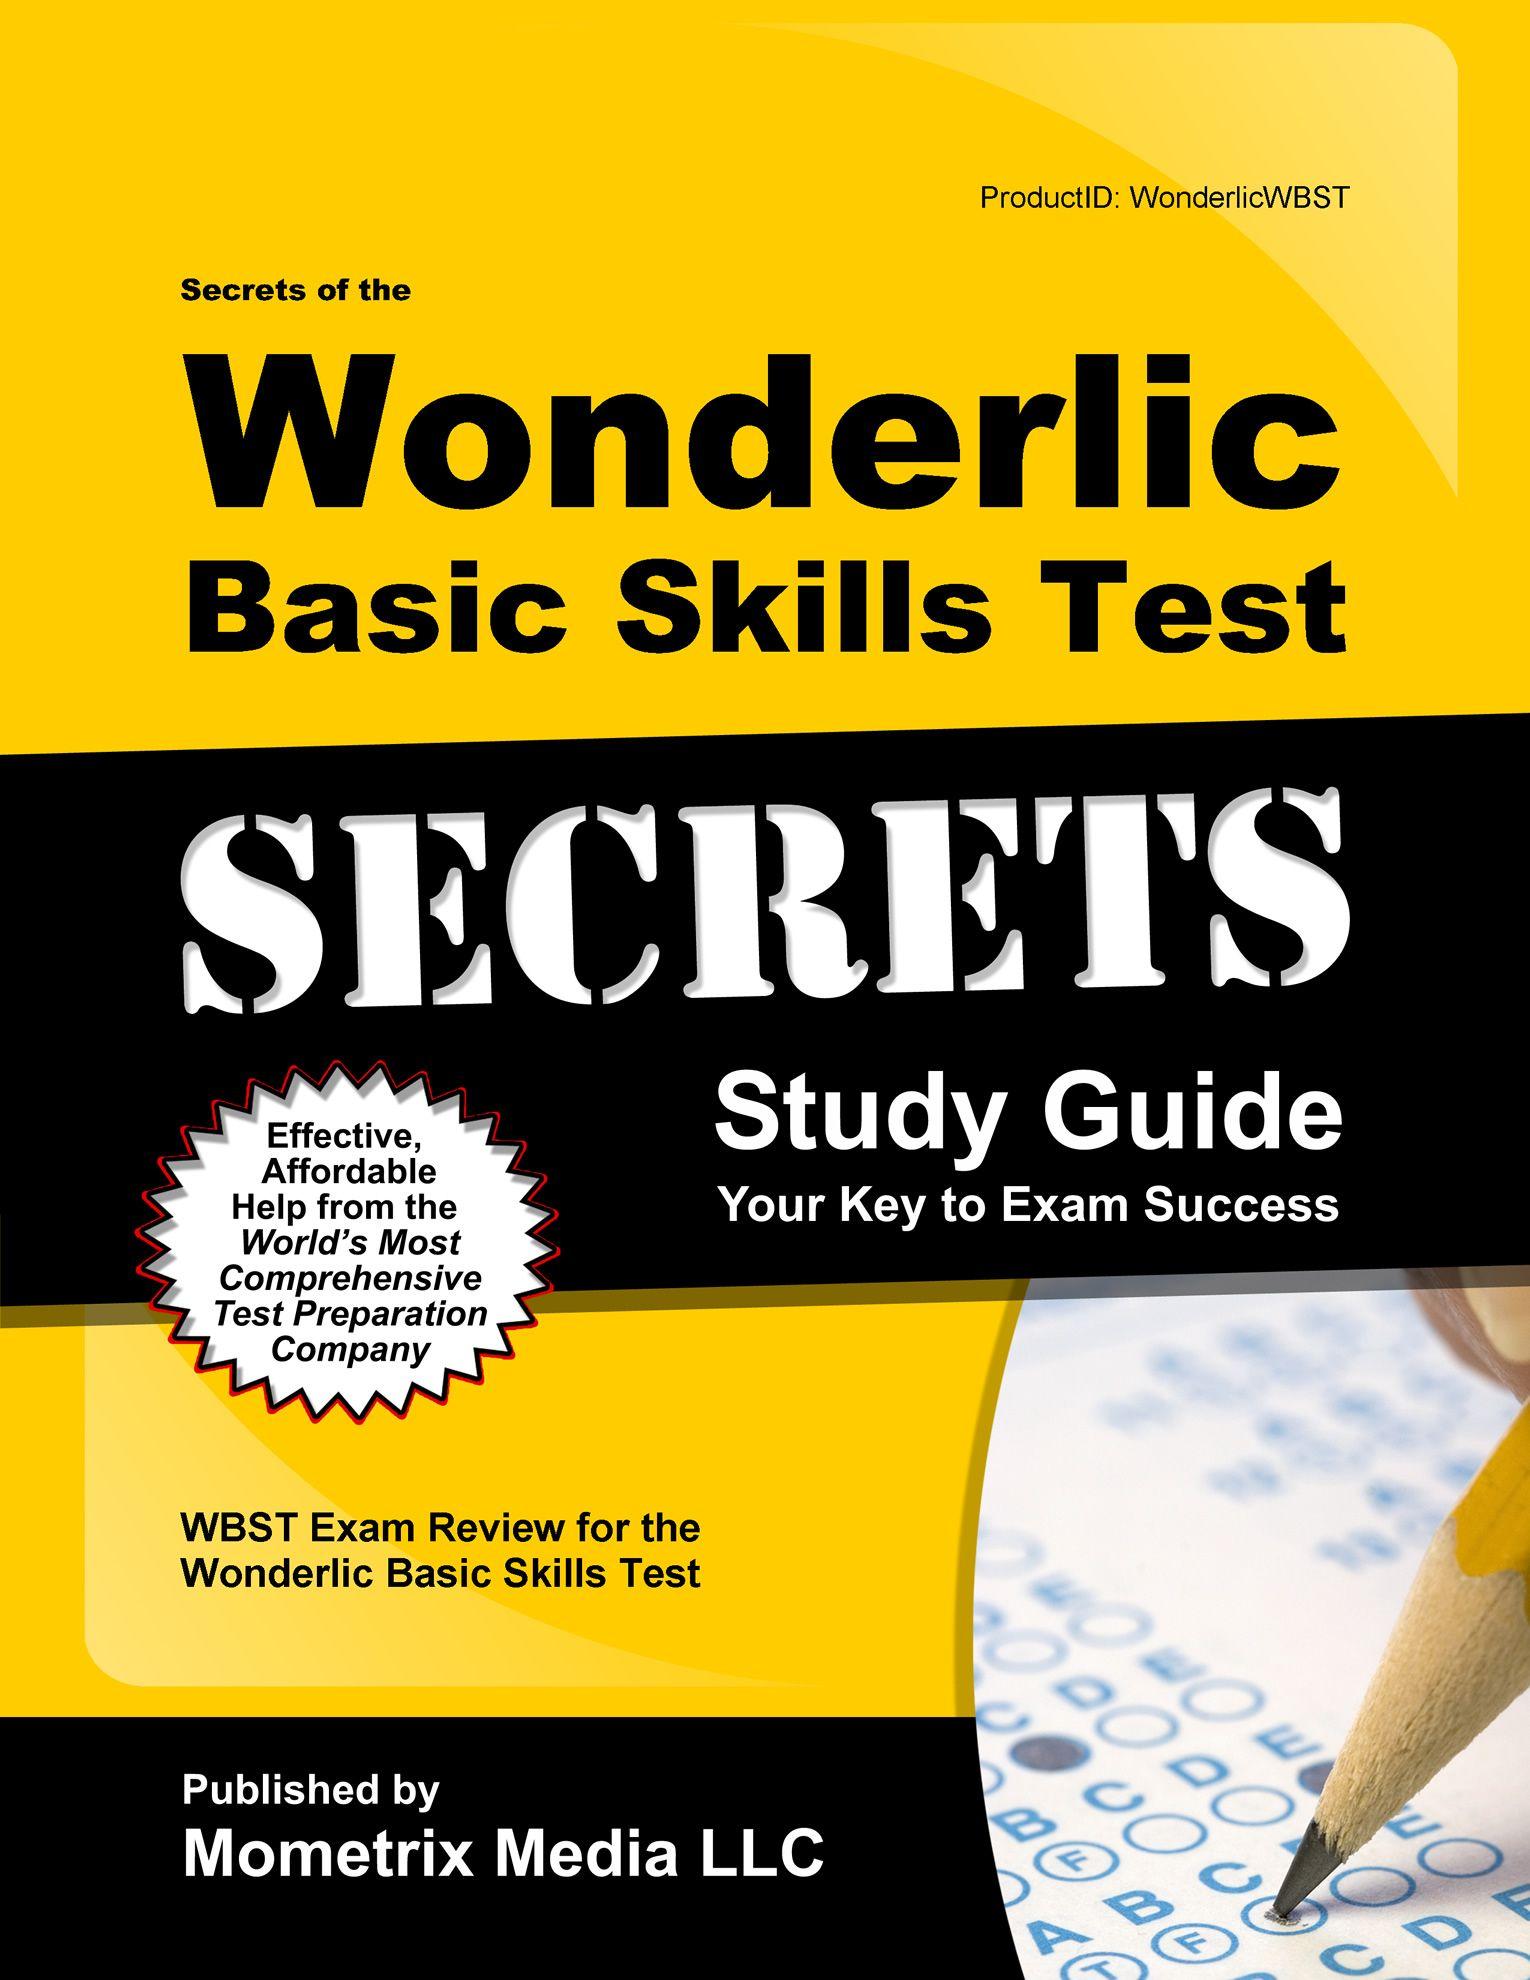 Wonderlic Basic Skills Test Study Guide http://mo-media.com/wonderlic/ # wonderlic